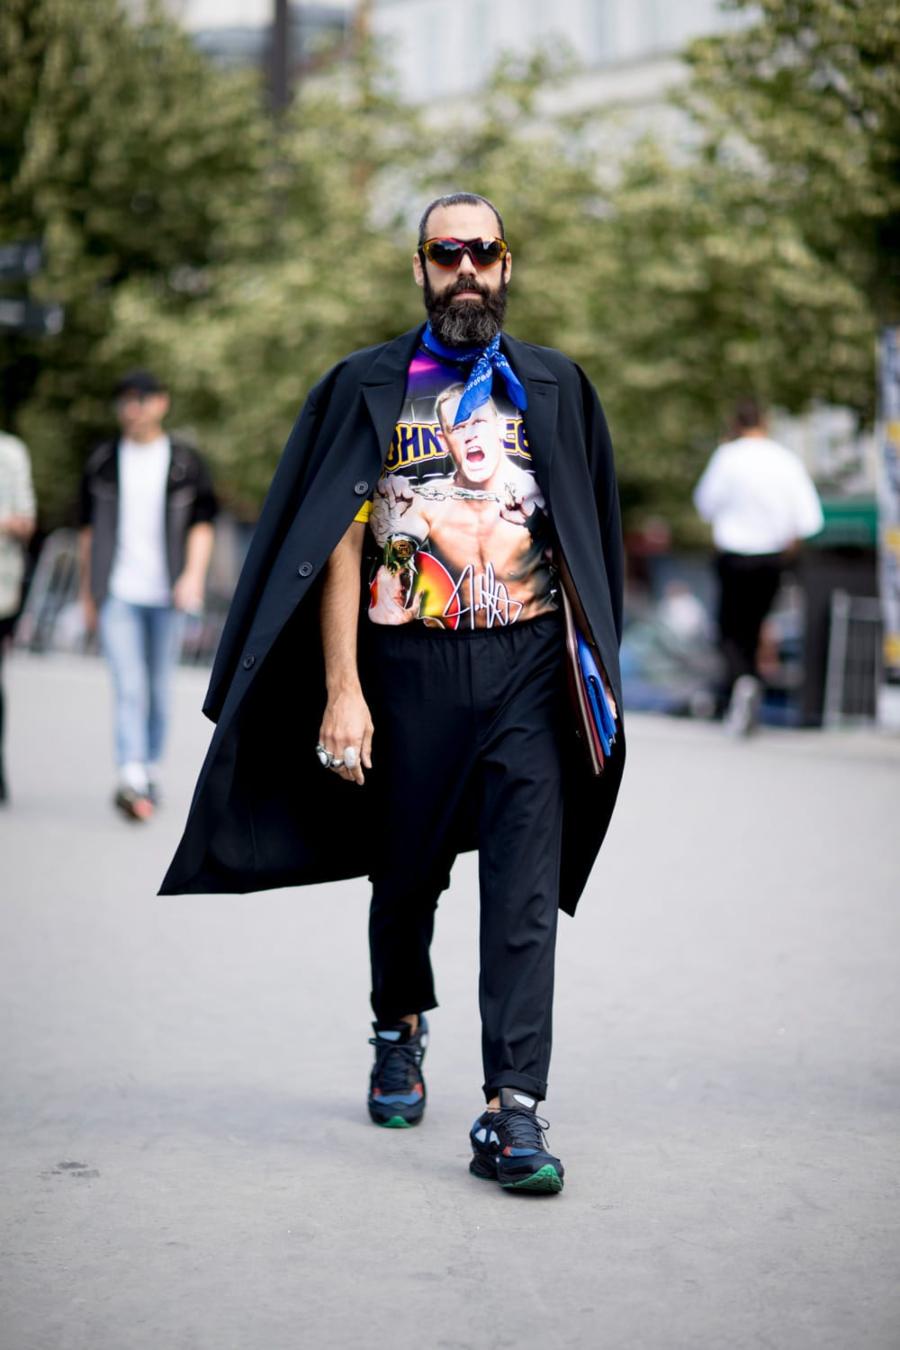 quần kaki màu đen